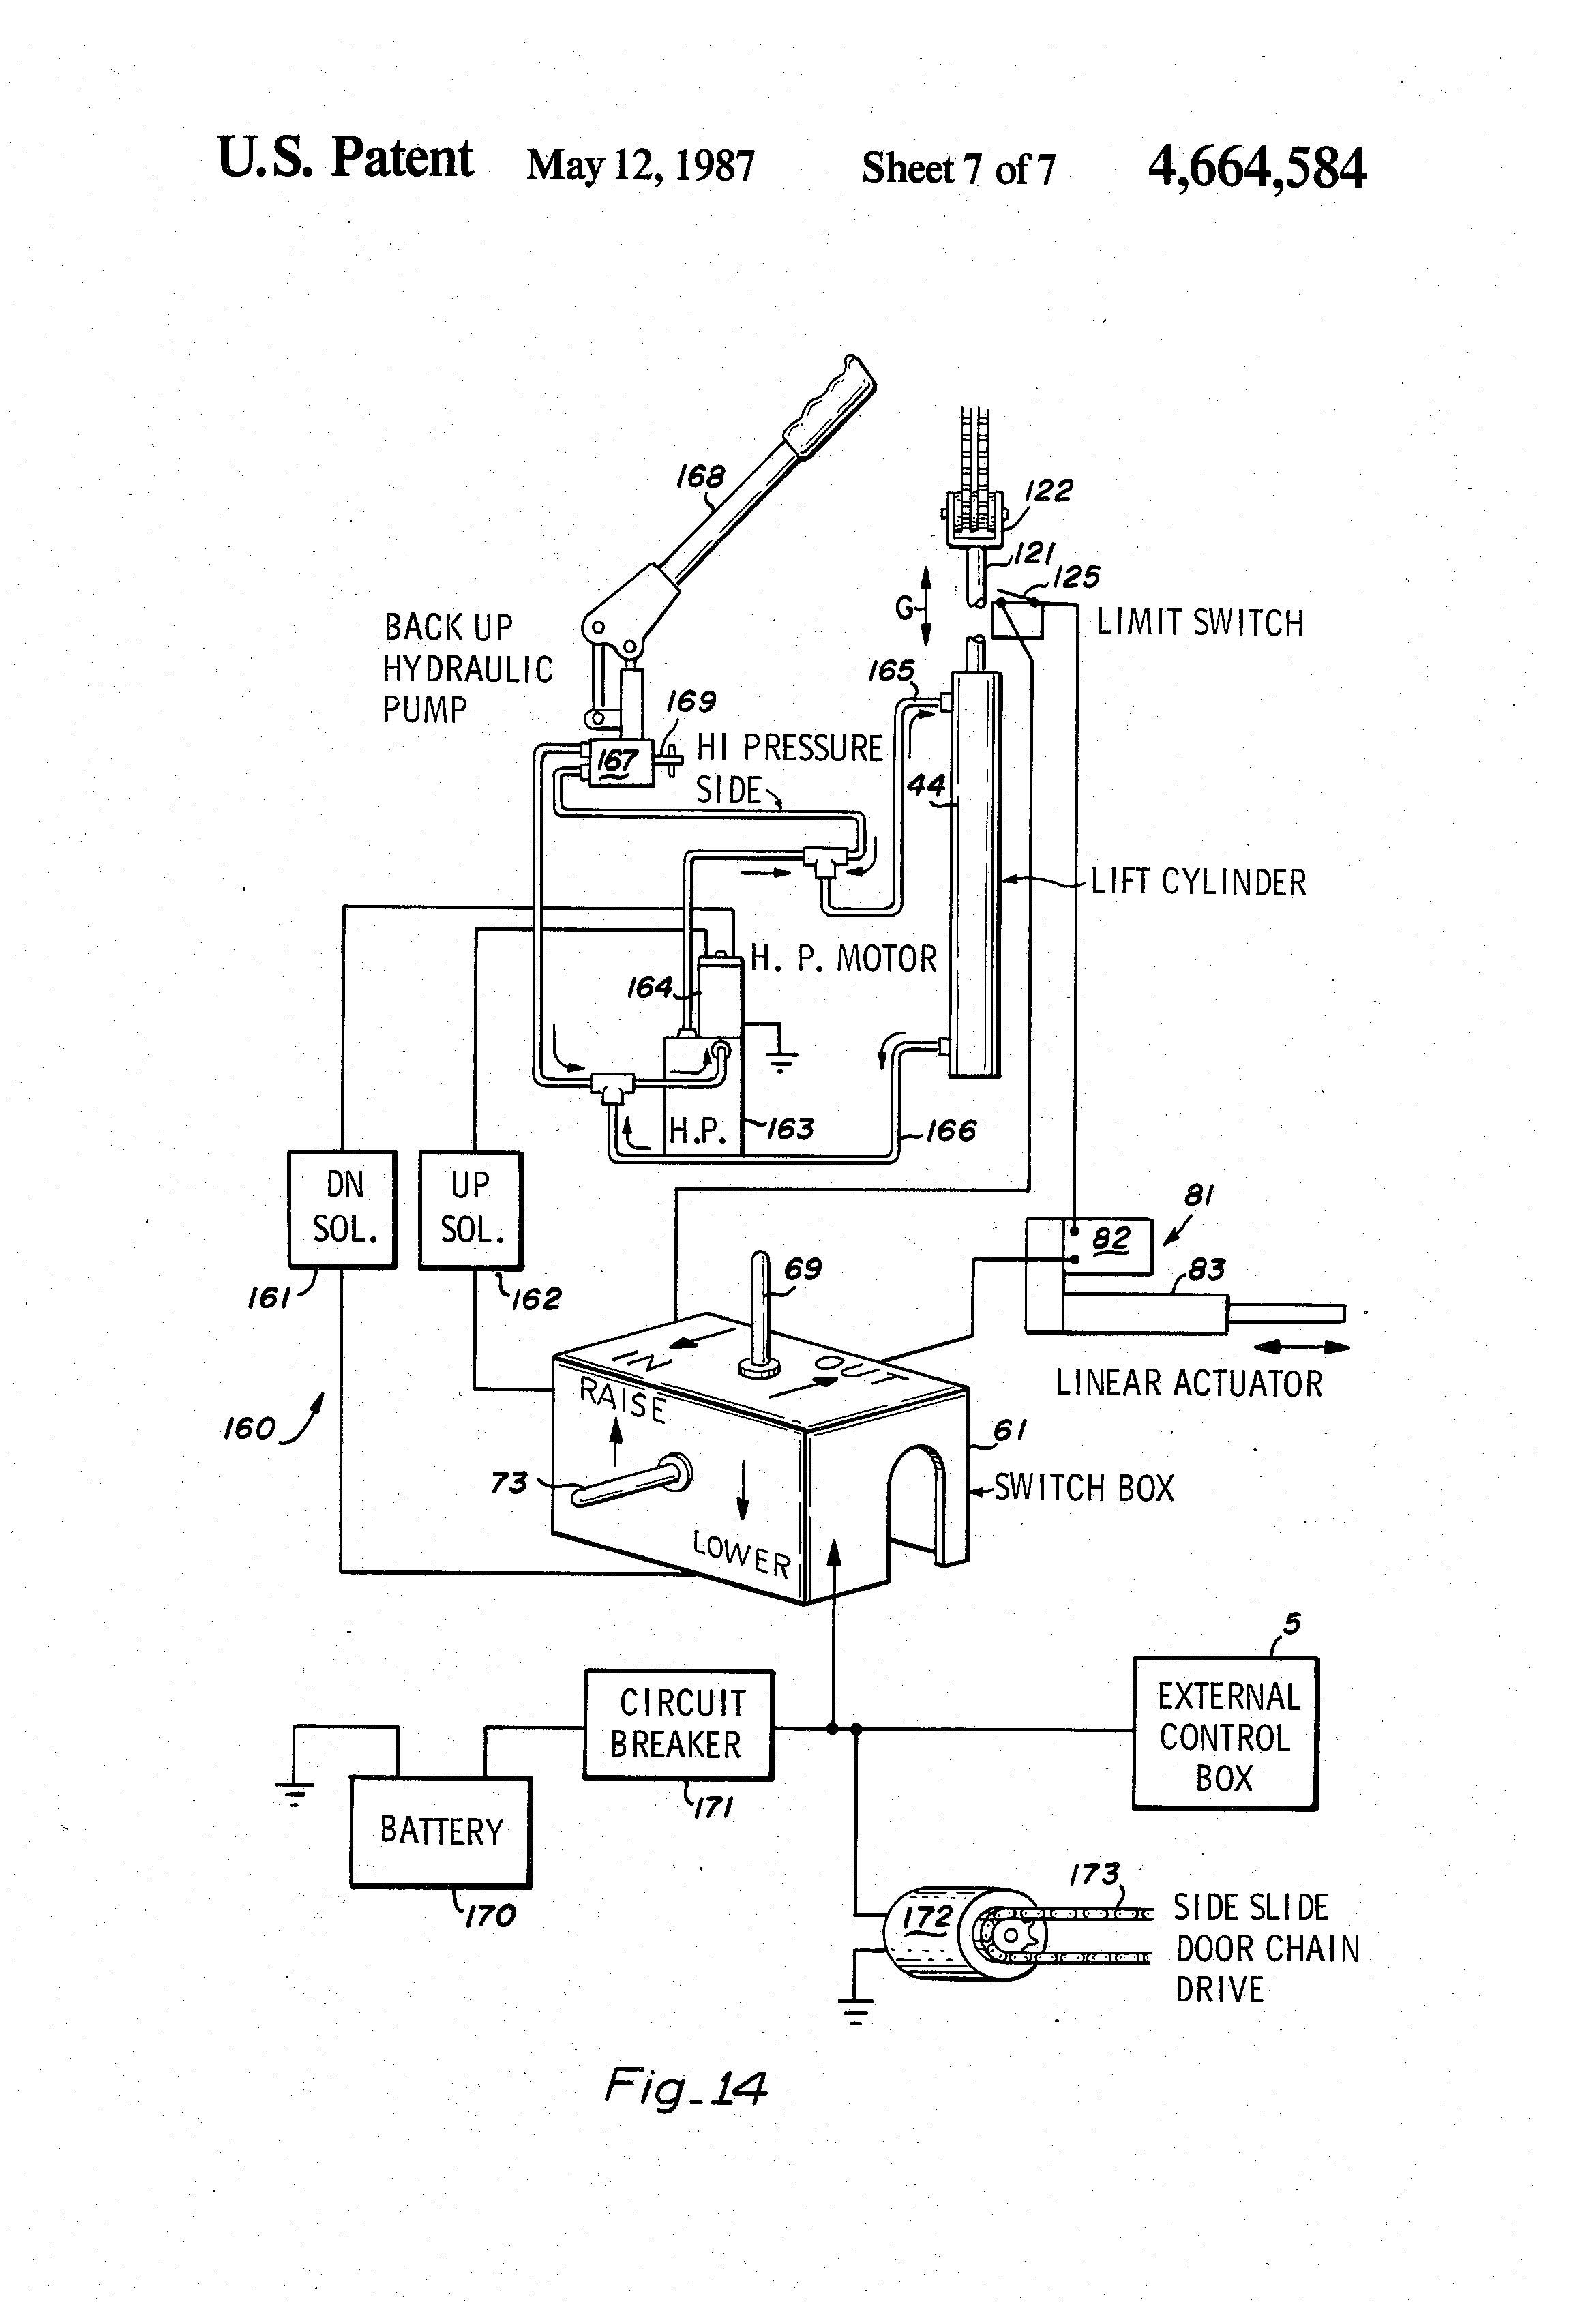 Automotive Lift Wiring Diagram Wiring Diagram Paper 3 Phase Car Hoist Wiring Diagram Car Hoist Wiring Diagram